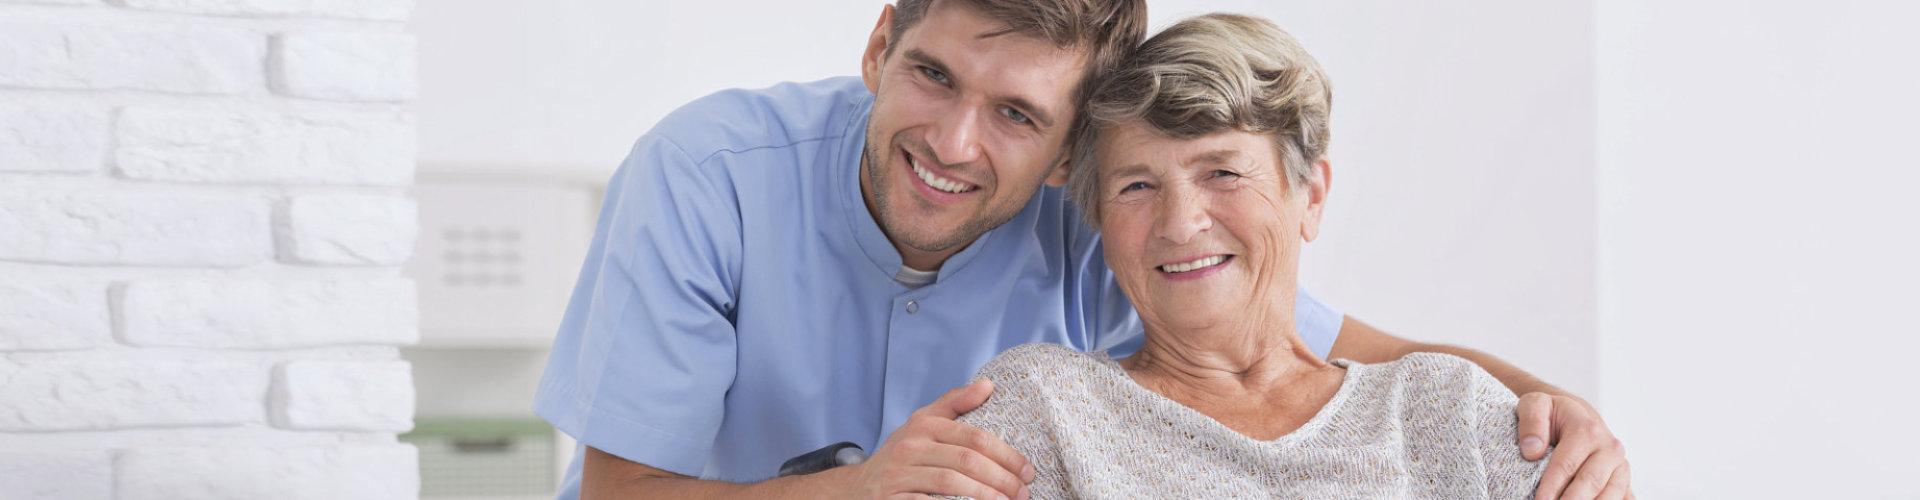 male caregiver hugging senior woman